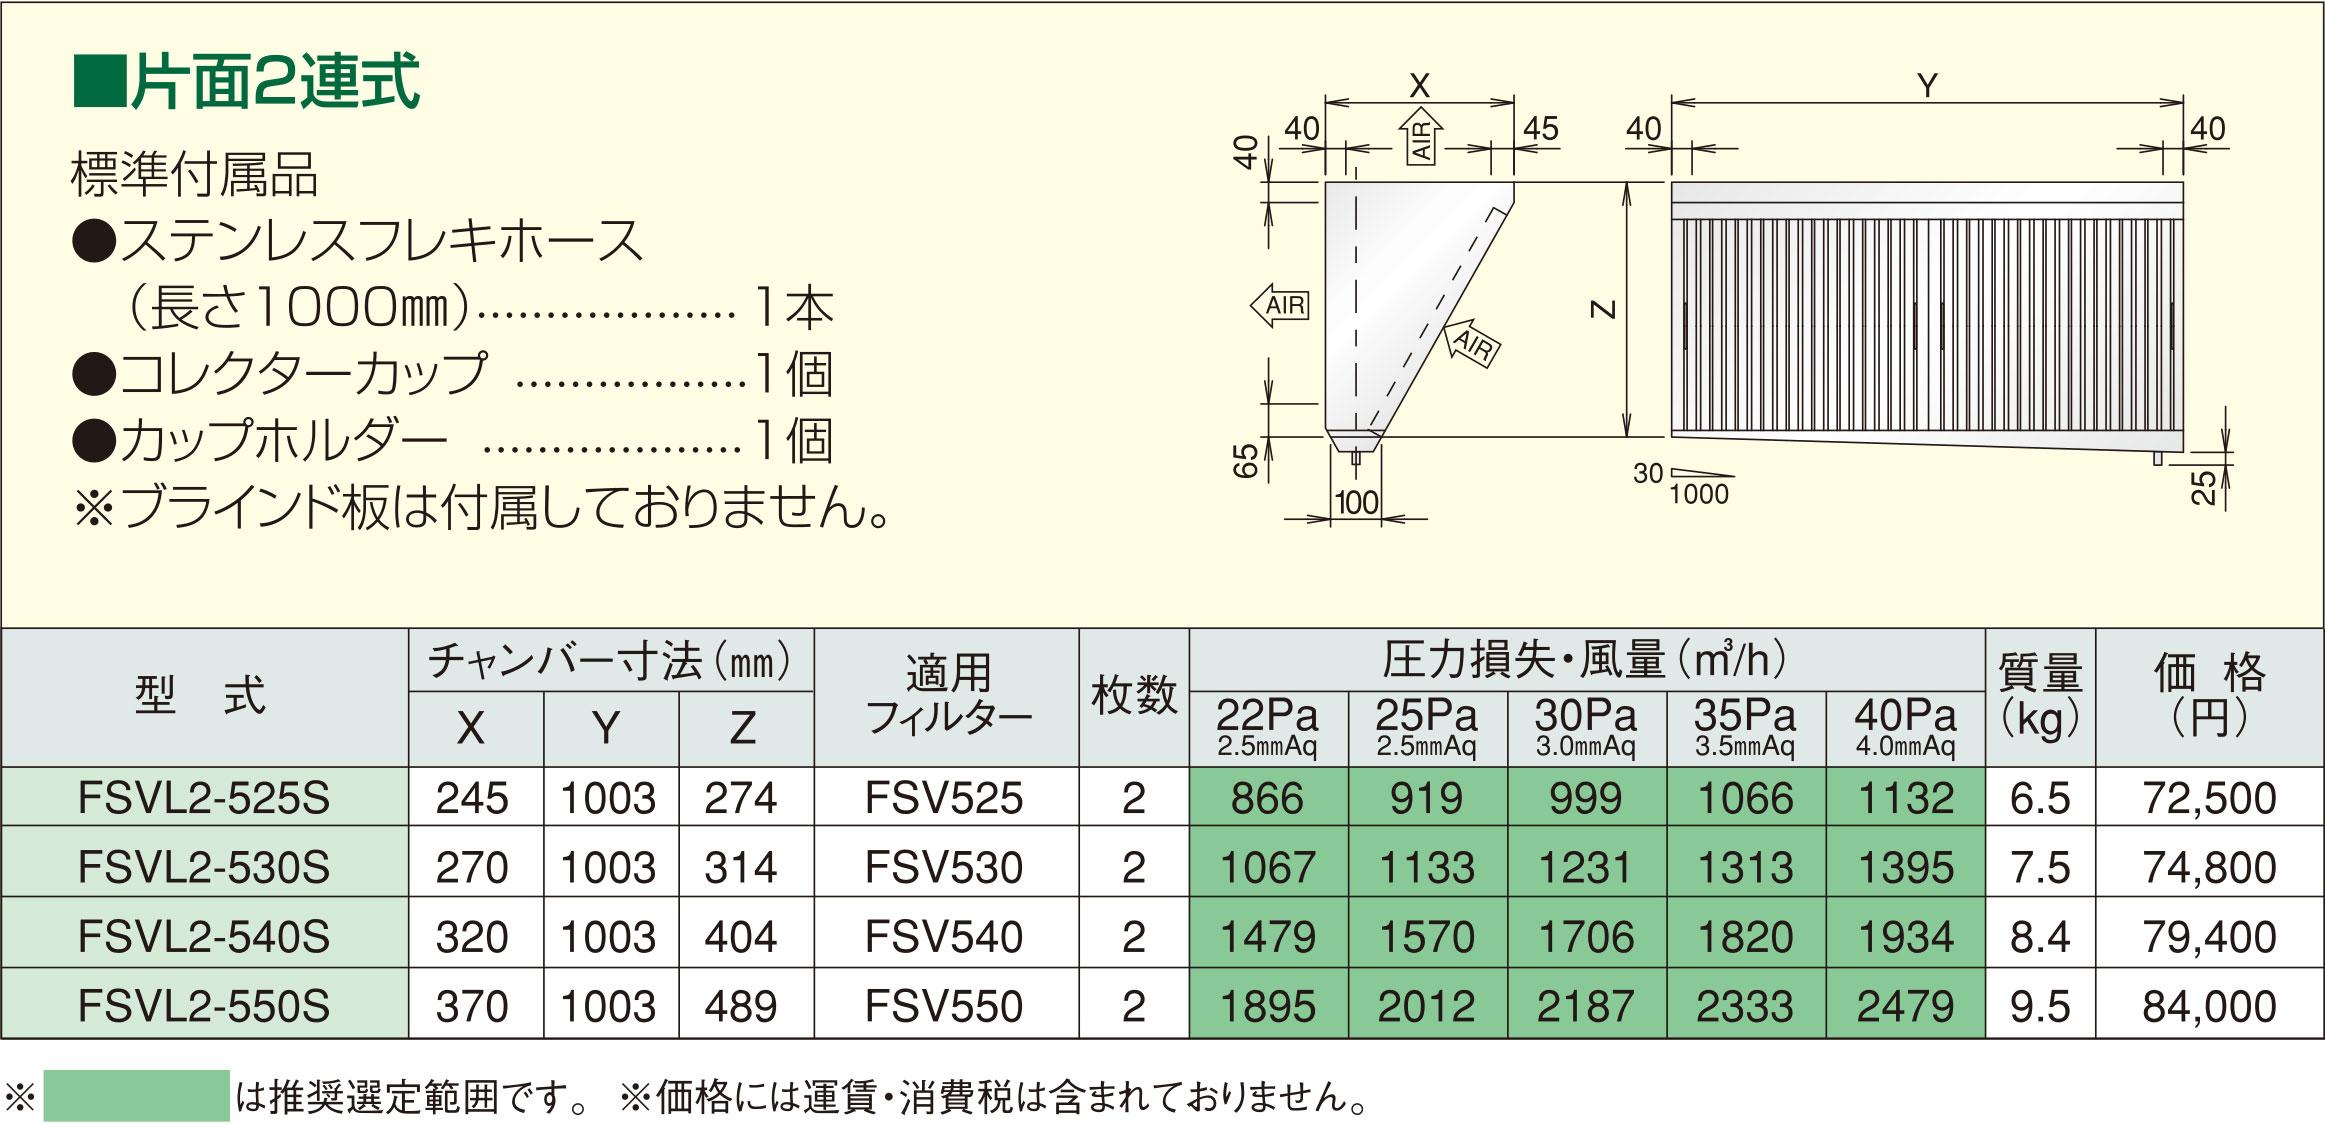 FSVL2-Sシリーズ